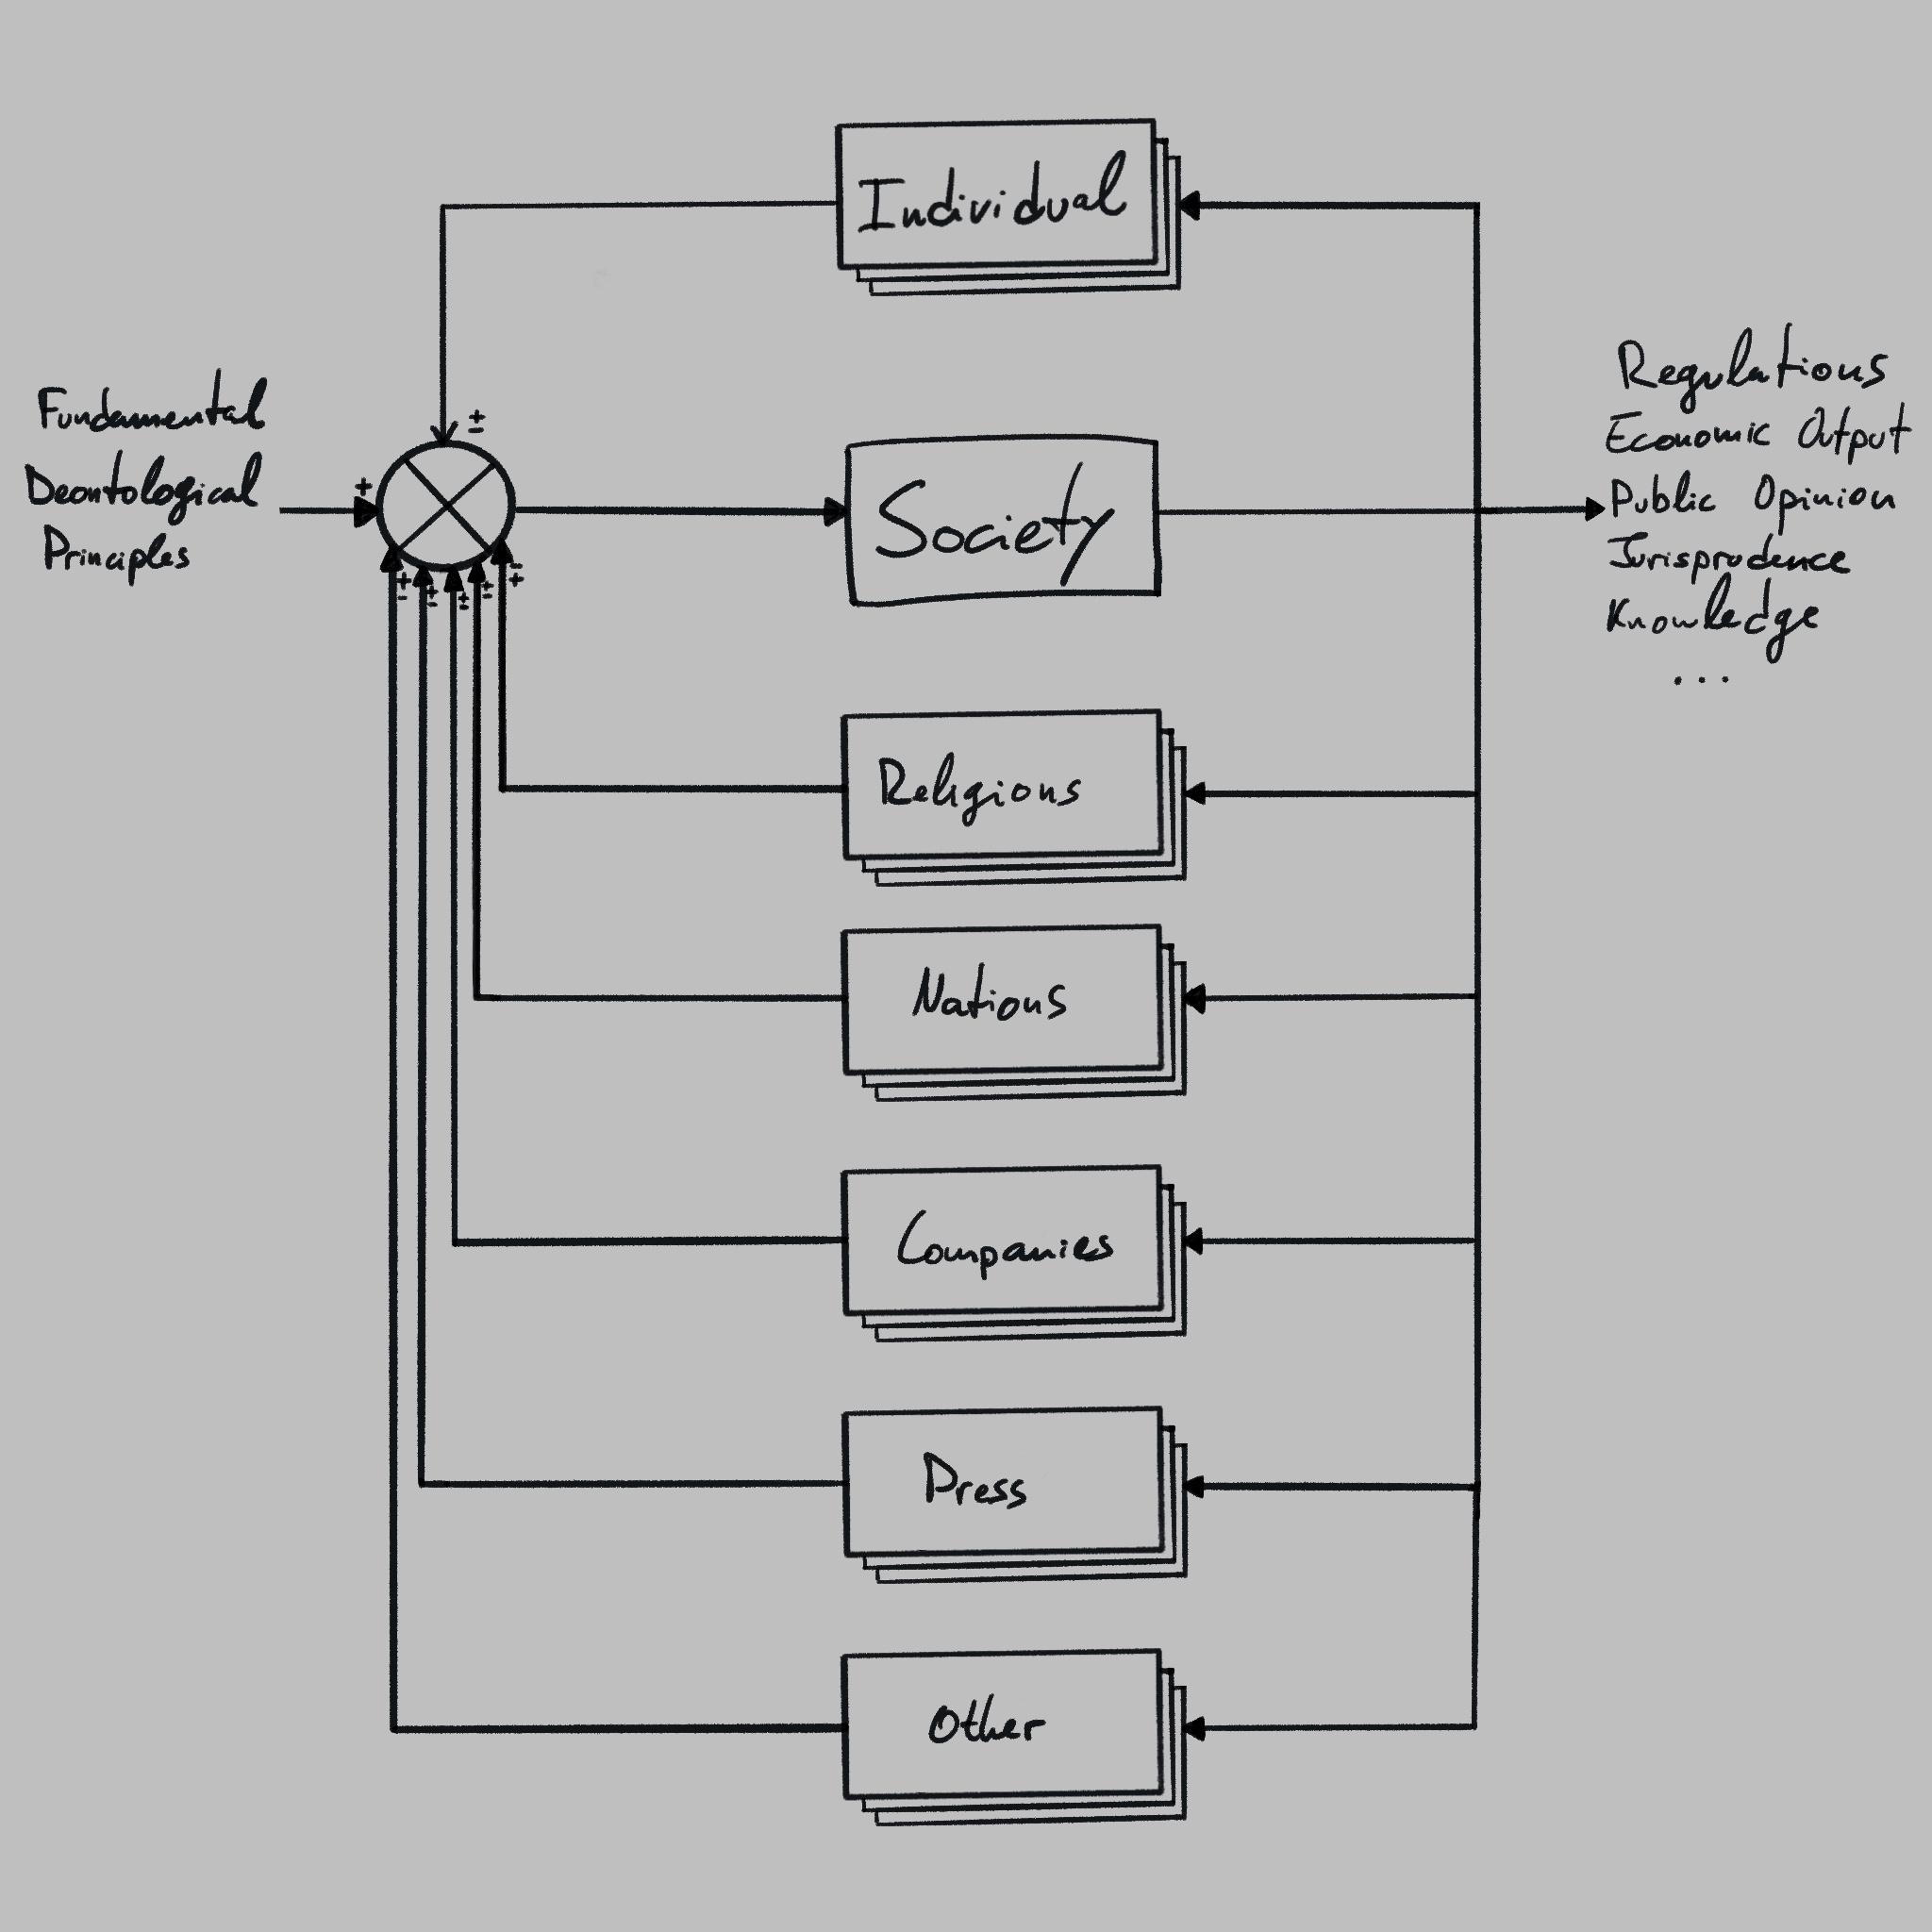 Diagram - Closed-loop public opinion control system